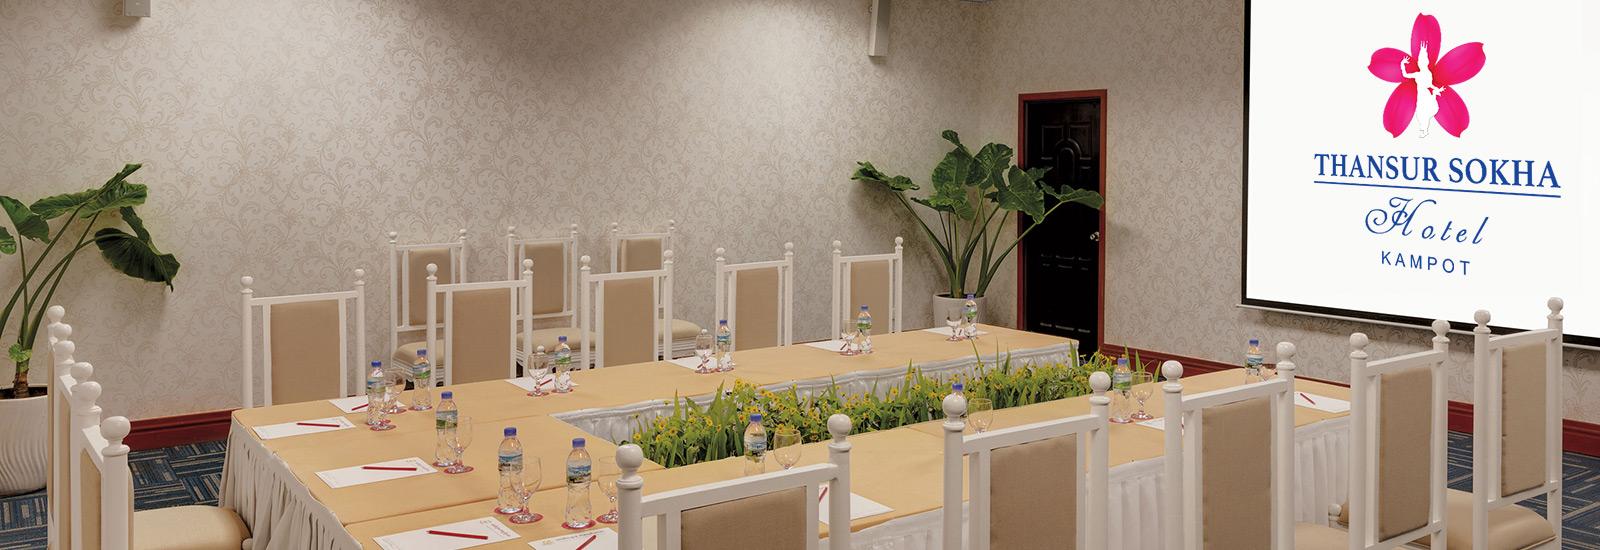 Bokor Meeting Room (Classroom Style)